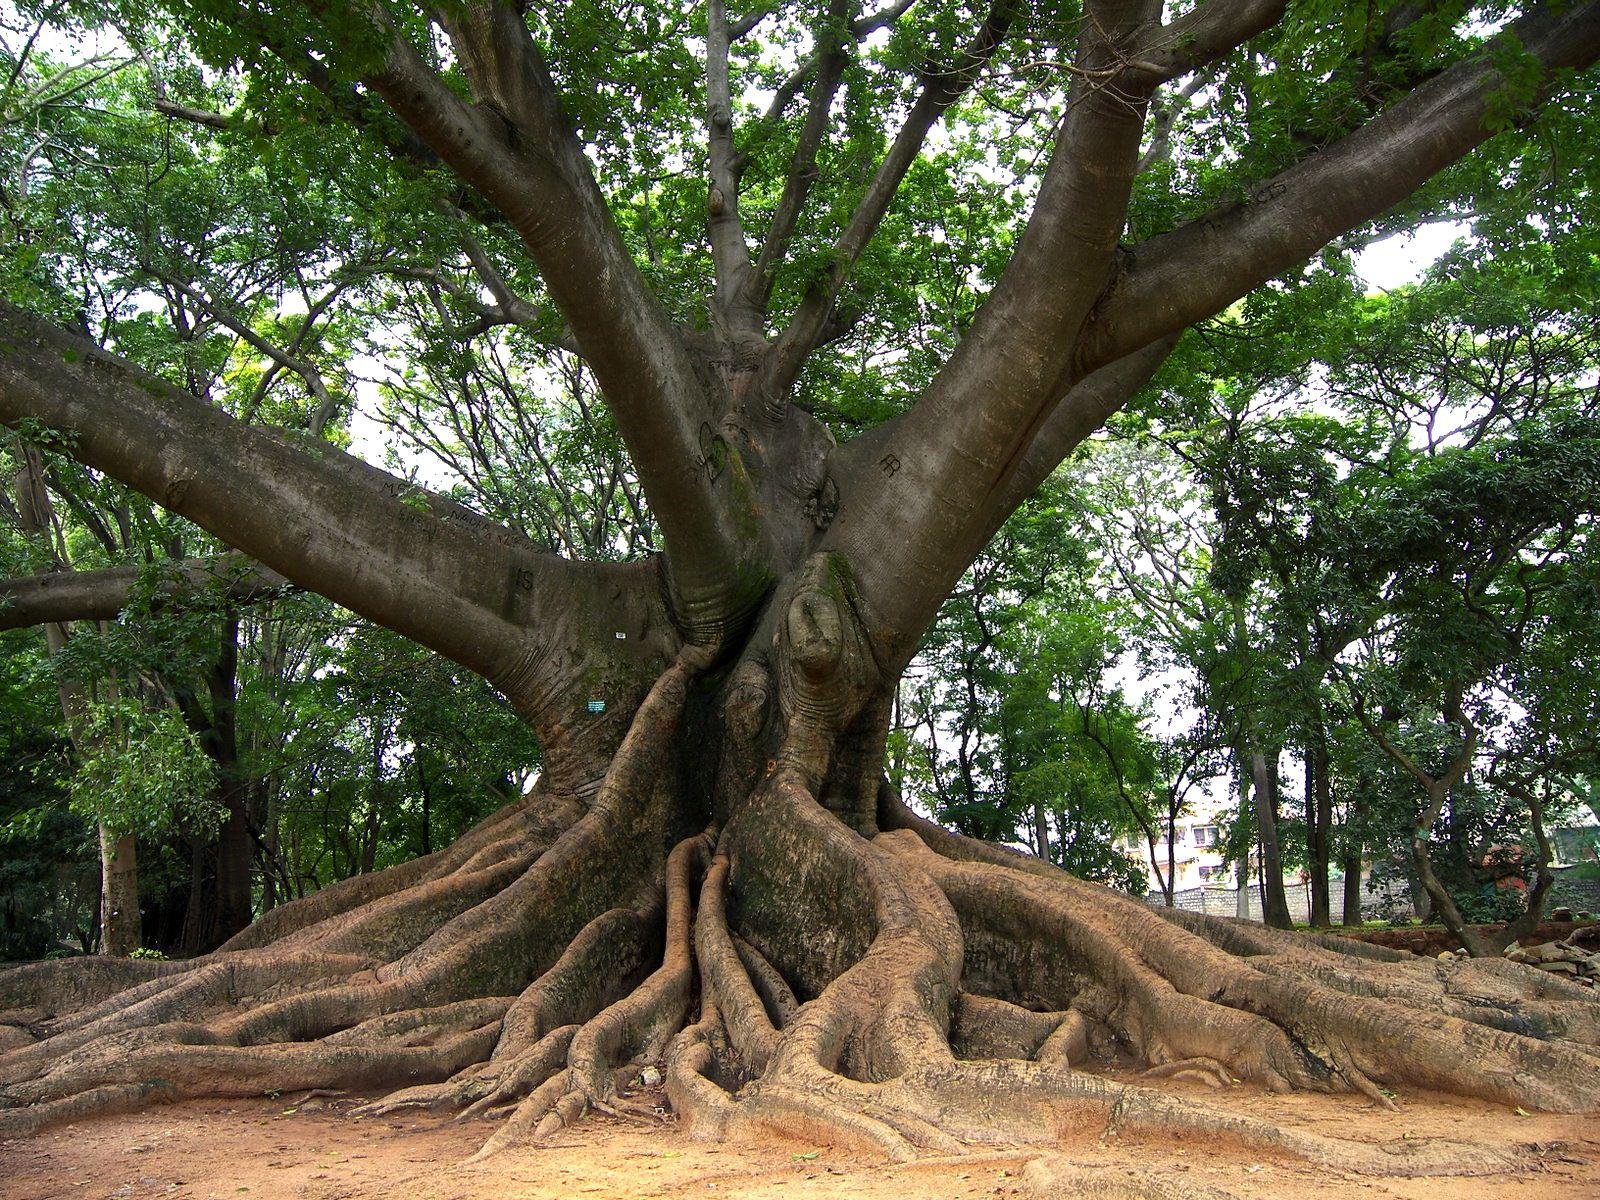 Kapok Tree [Ceiba pentandra] is a tropical tree of the order